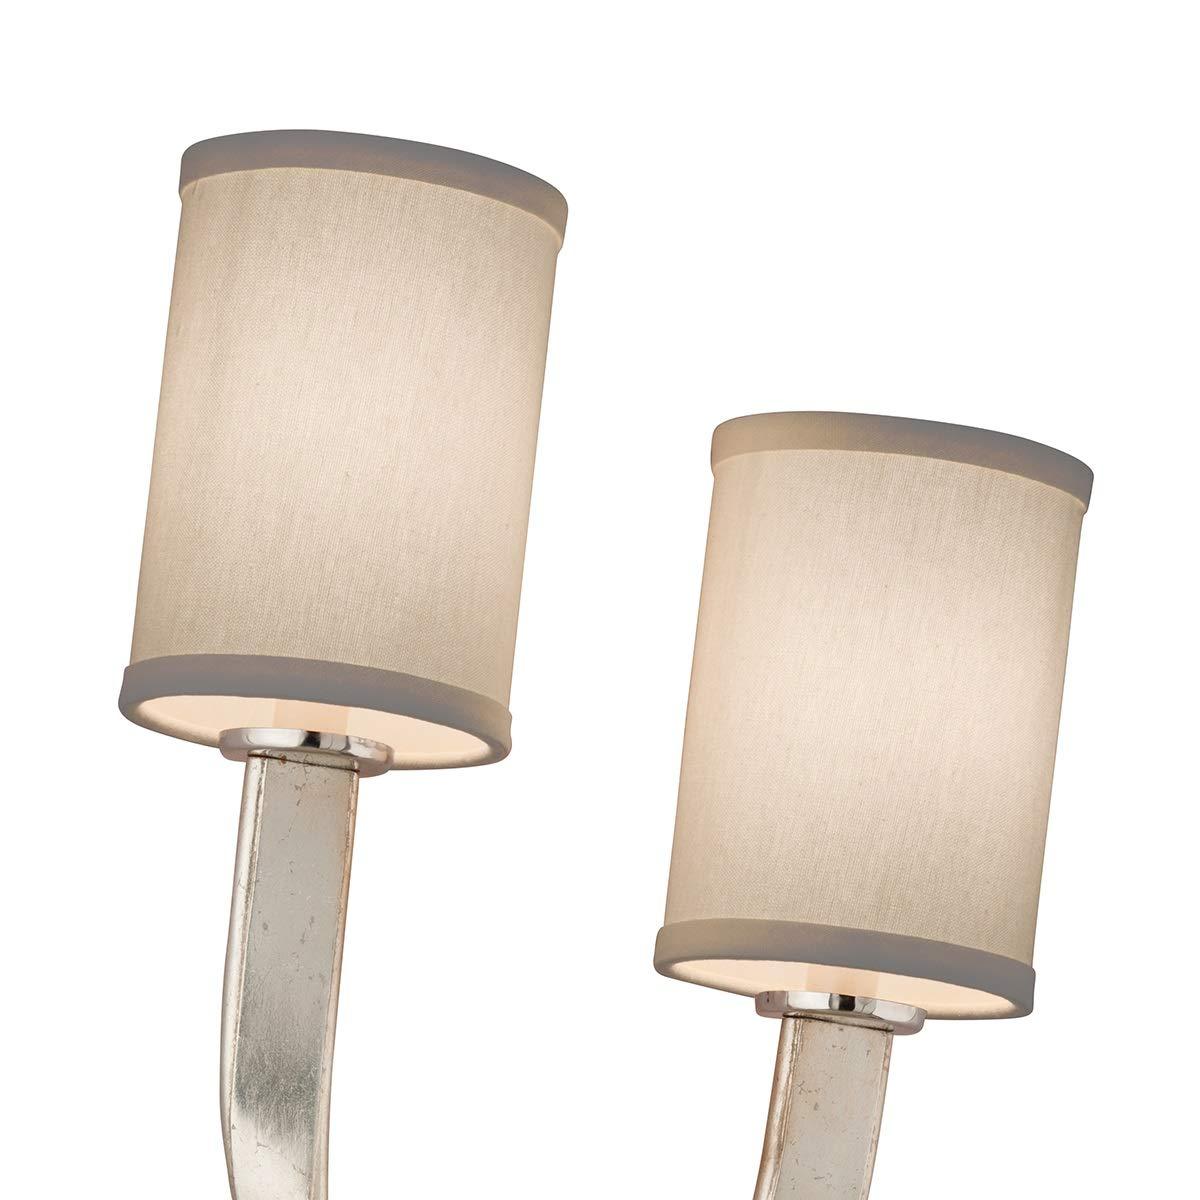 Amazon.com: Corbett iluminación 158 – 11 Roxy 2 luz 12